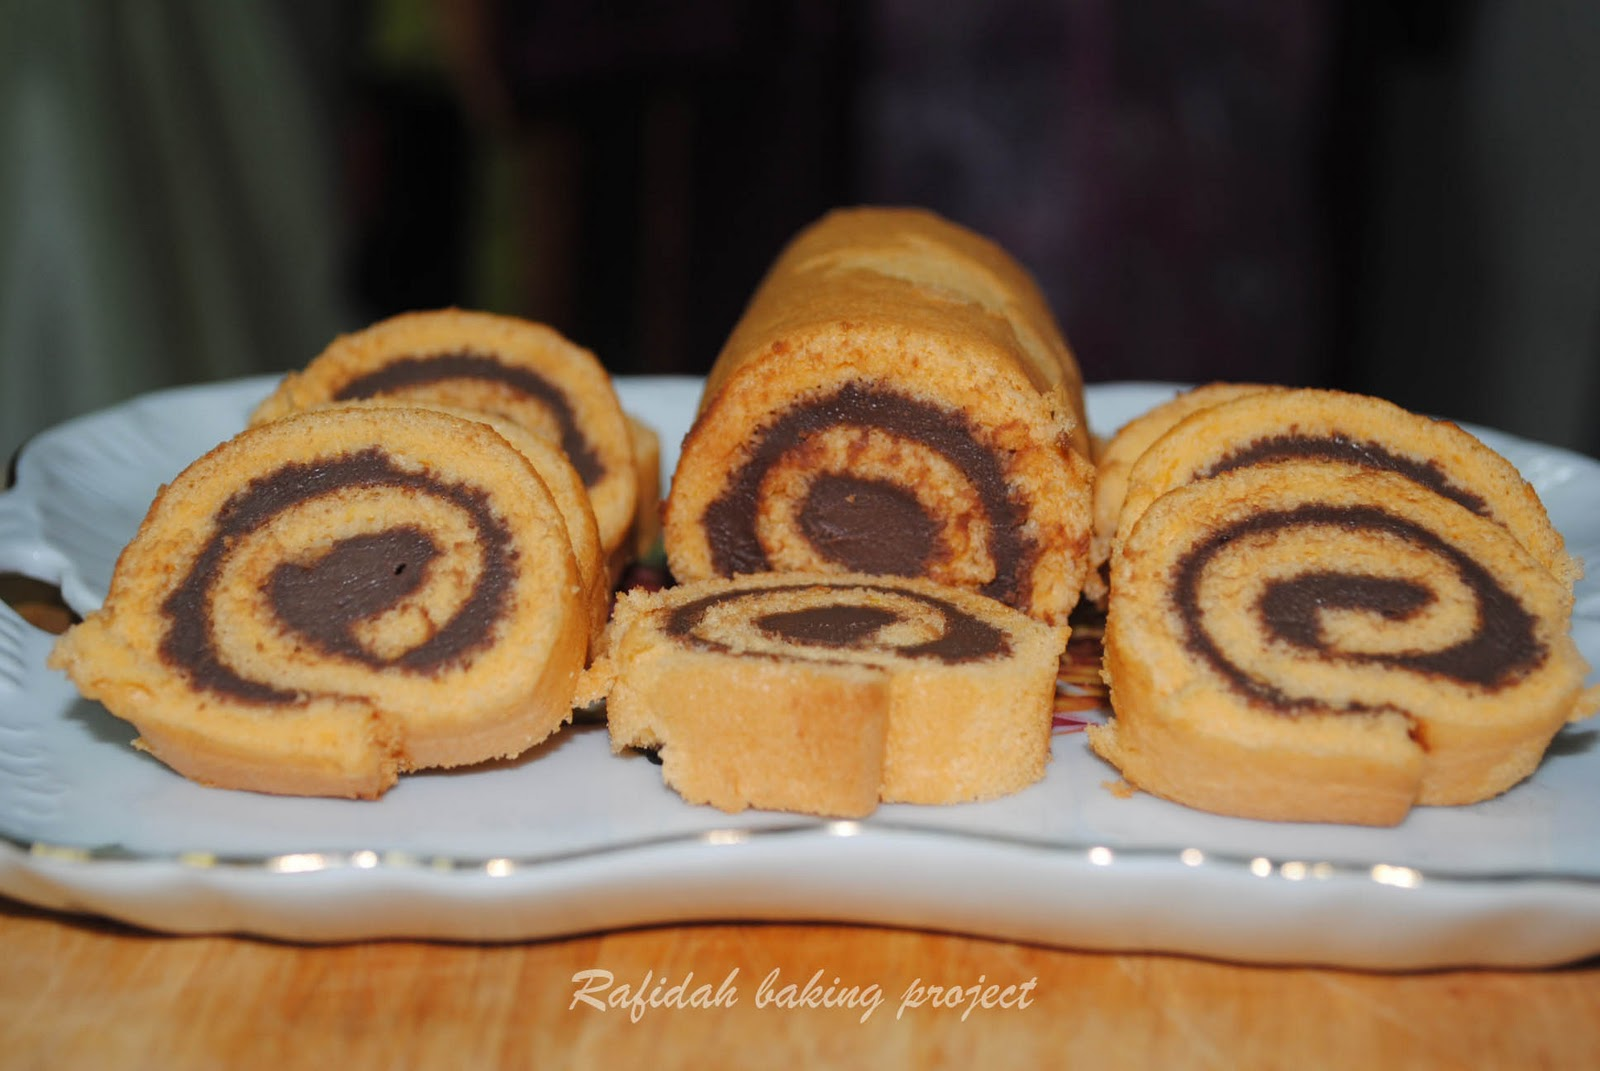 ... kek batik chef wan http ajilbab com resepi resepi swiss roll kek htm